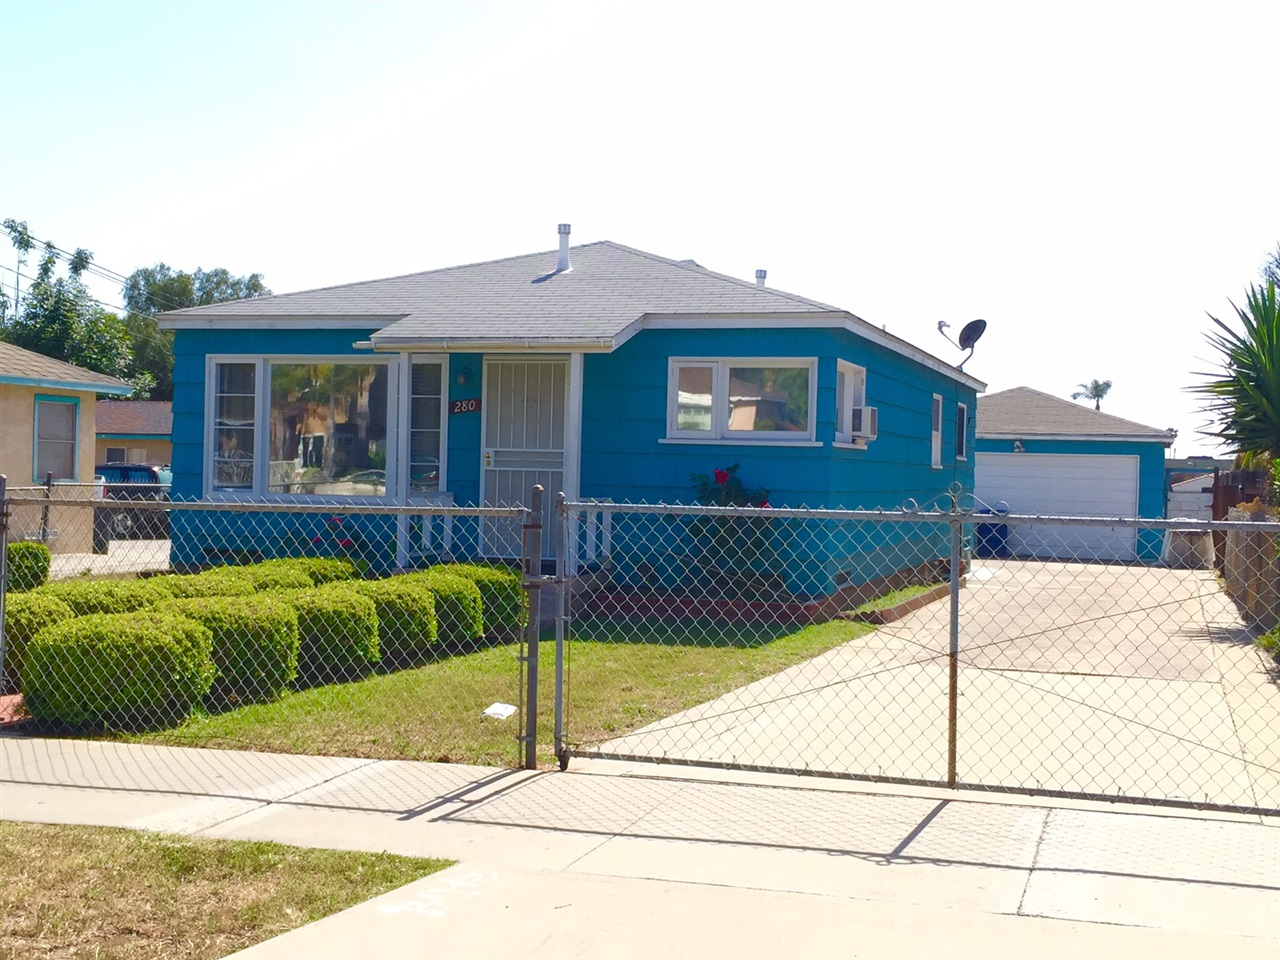 280 5th Ave, Chula Vista, CA